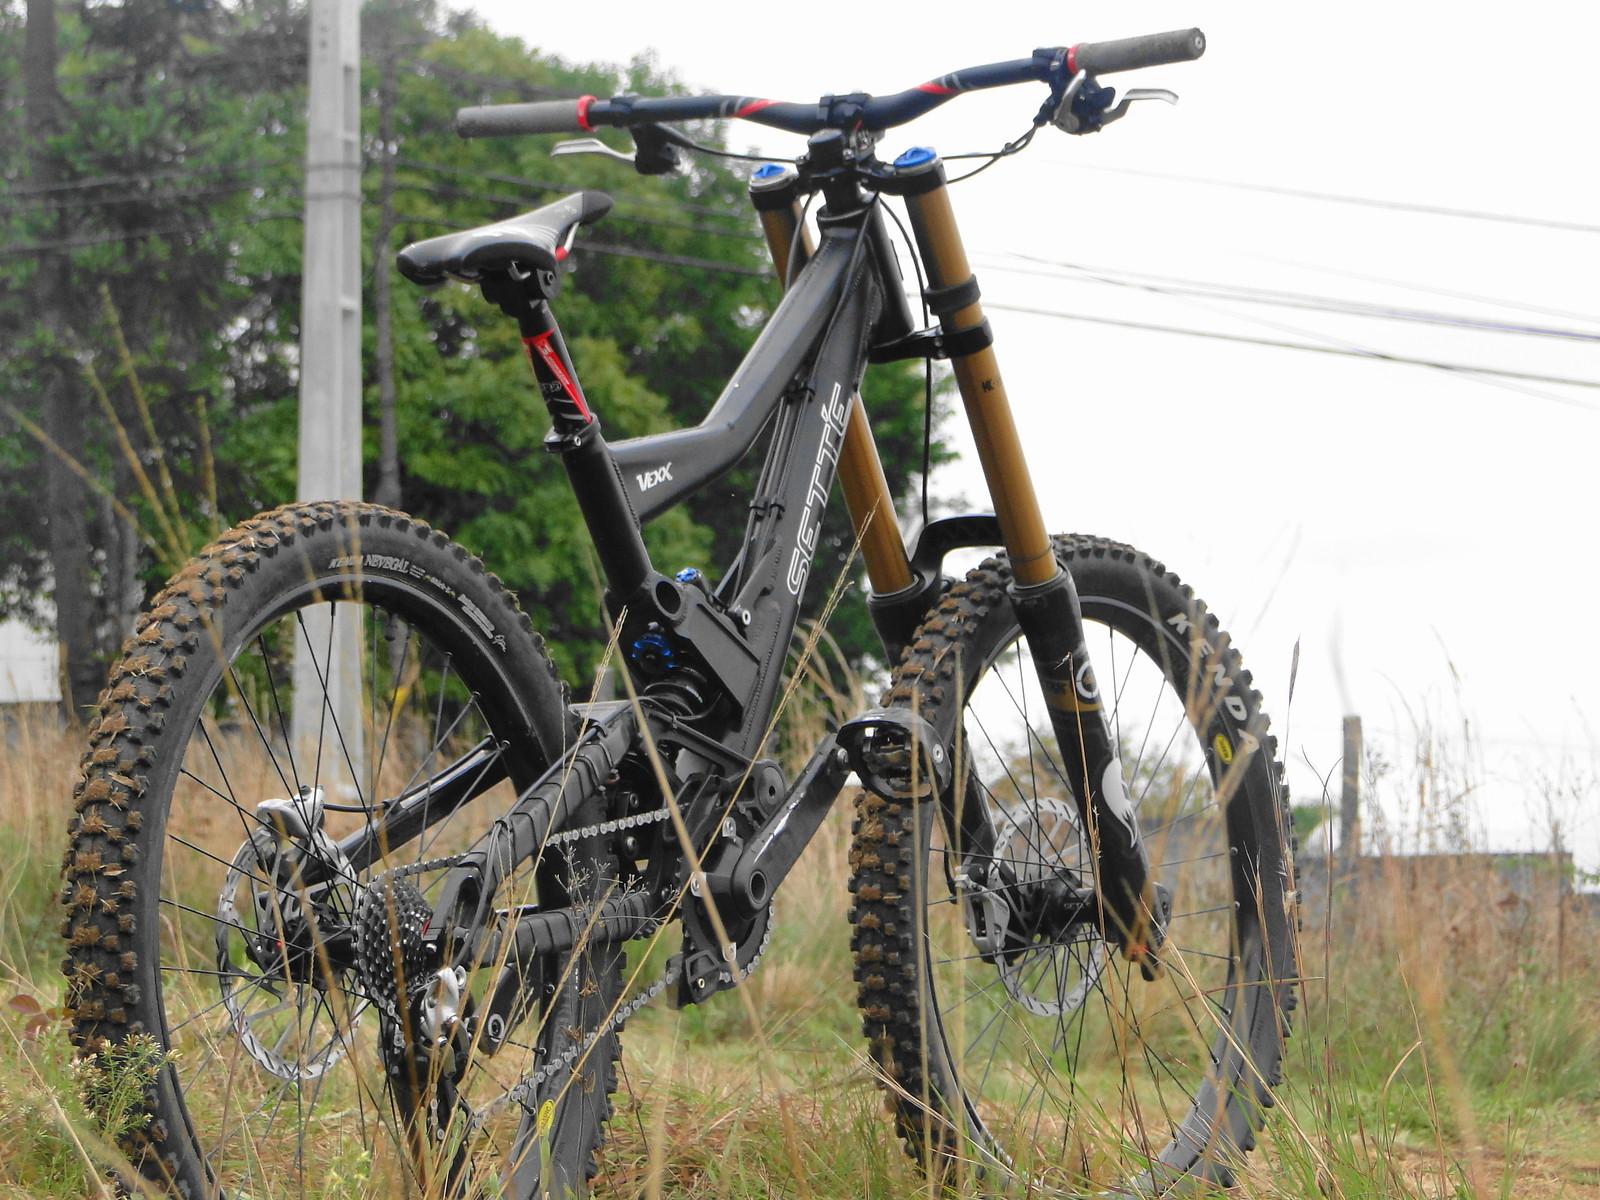 Sette Vexx - Jefferson_Silva - Mountain Biking Pictures - Vital MTB